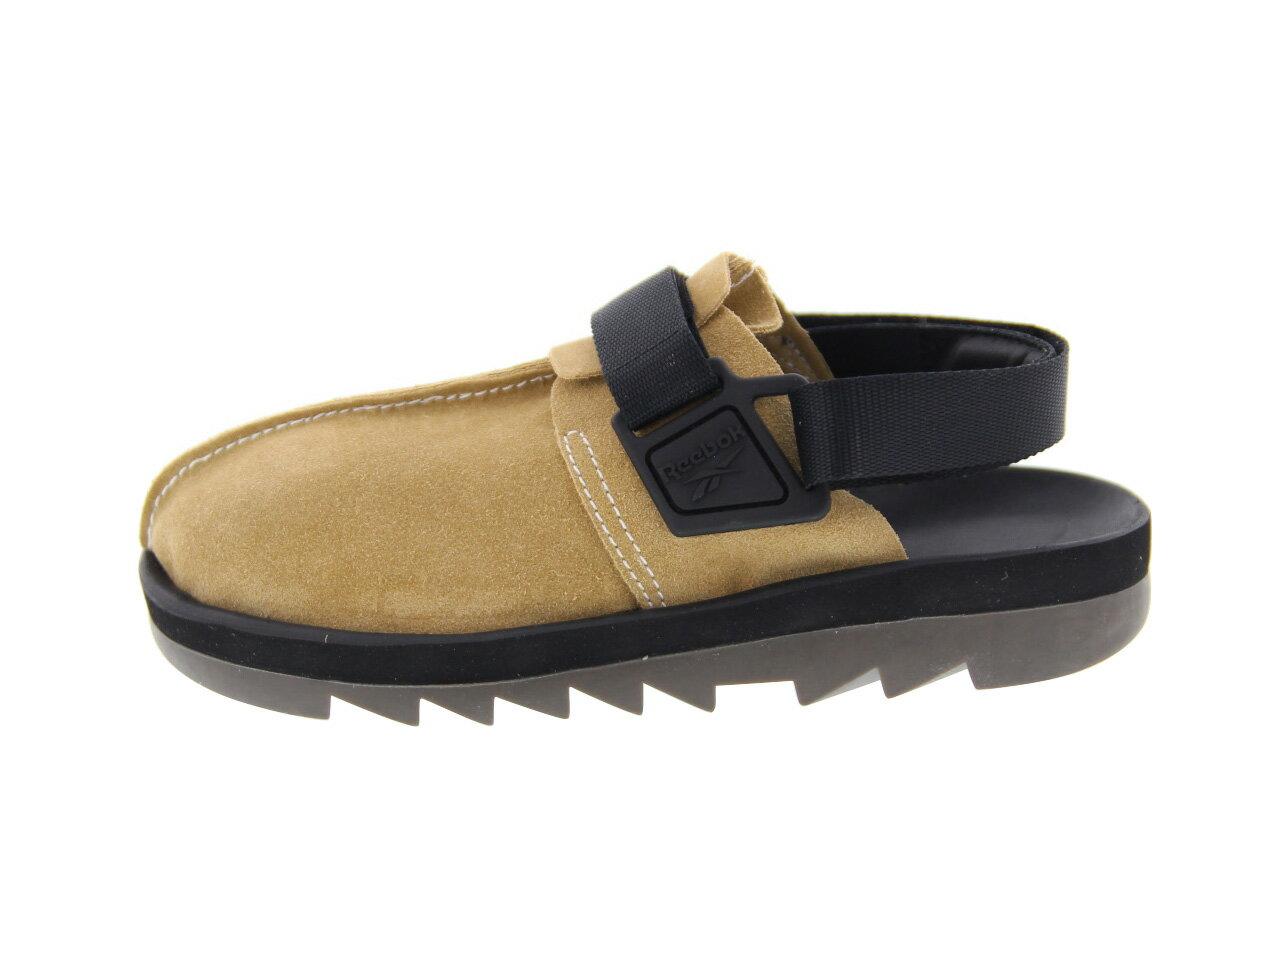 Reebok BEATNIK(CN3731)TWEED BROWN/BLACK【リーボック ビートニック】【靴】【サンダル】【アウトドア】【Reebok CLASSIC】